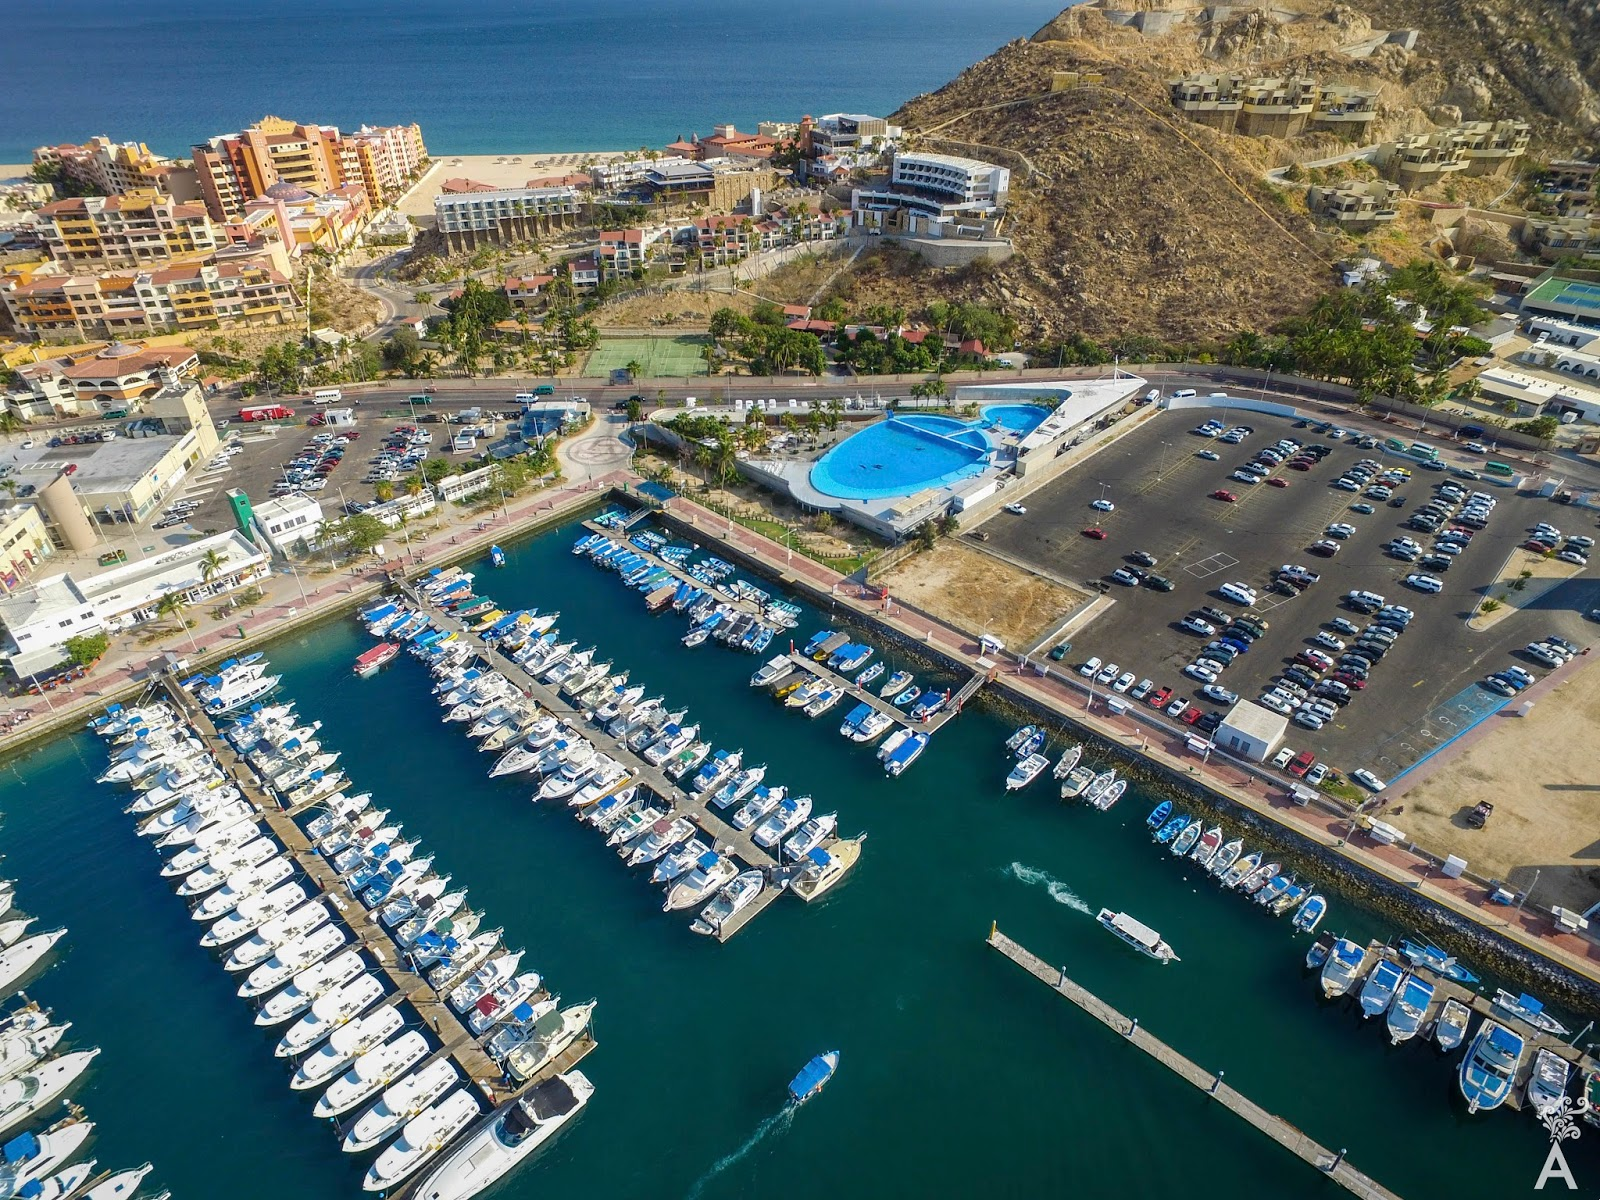 The Best Restaurants In Quot El Corredor Turistico